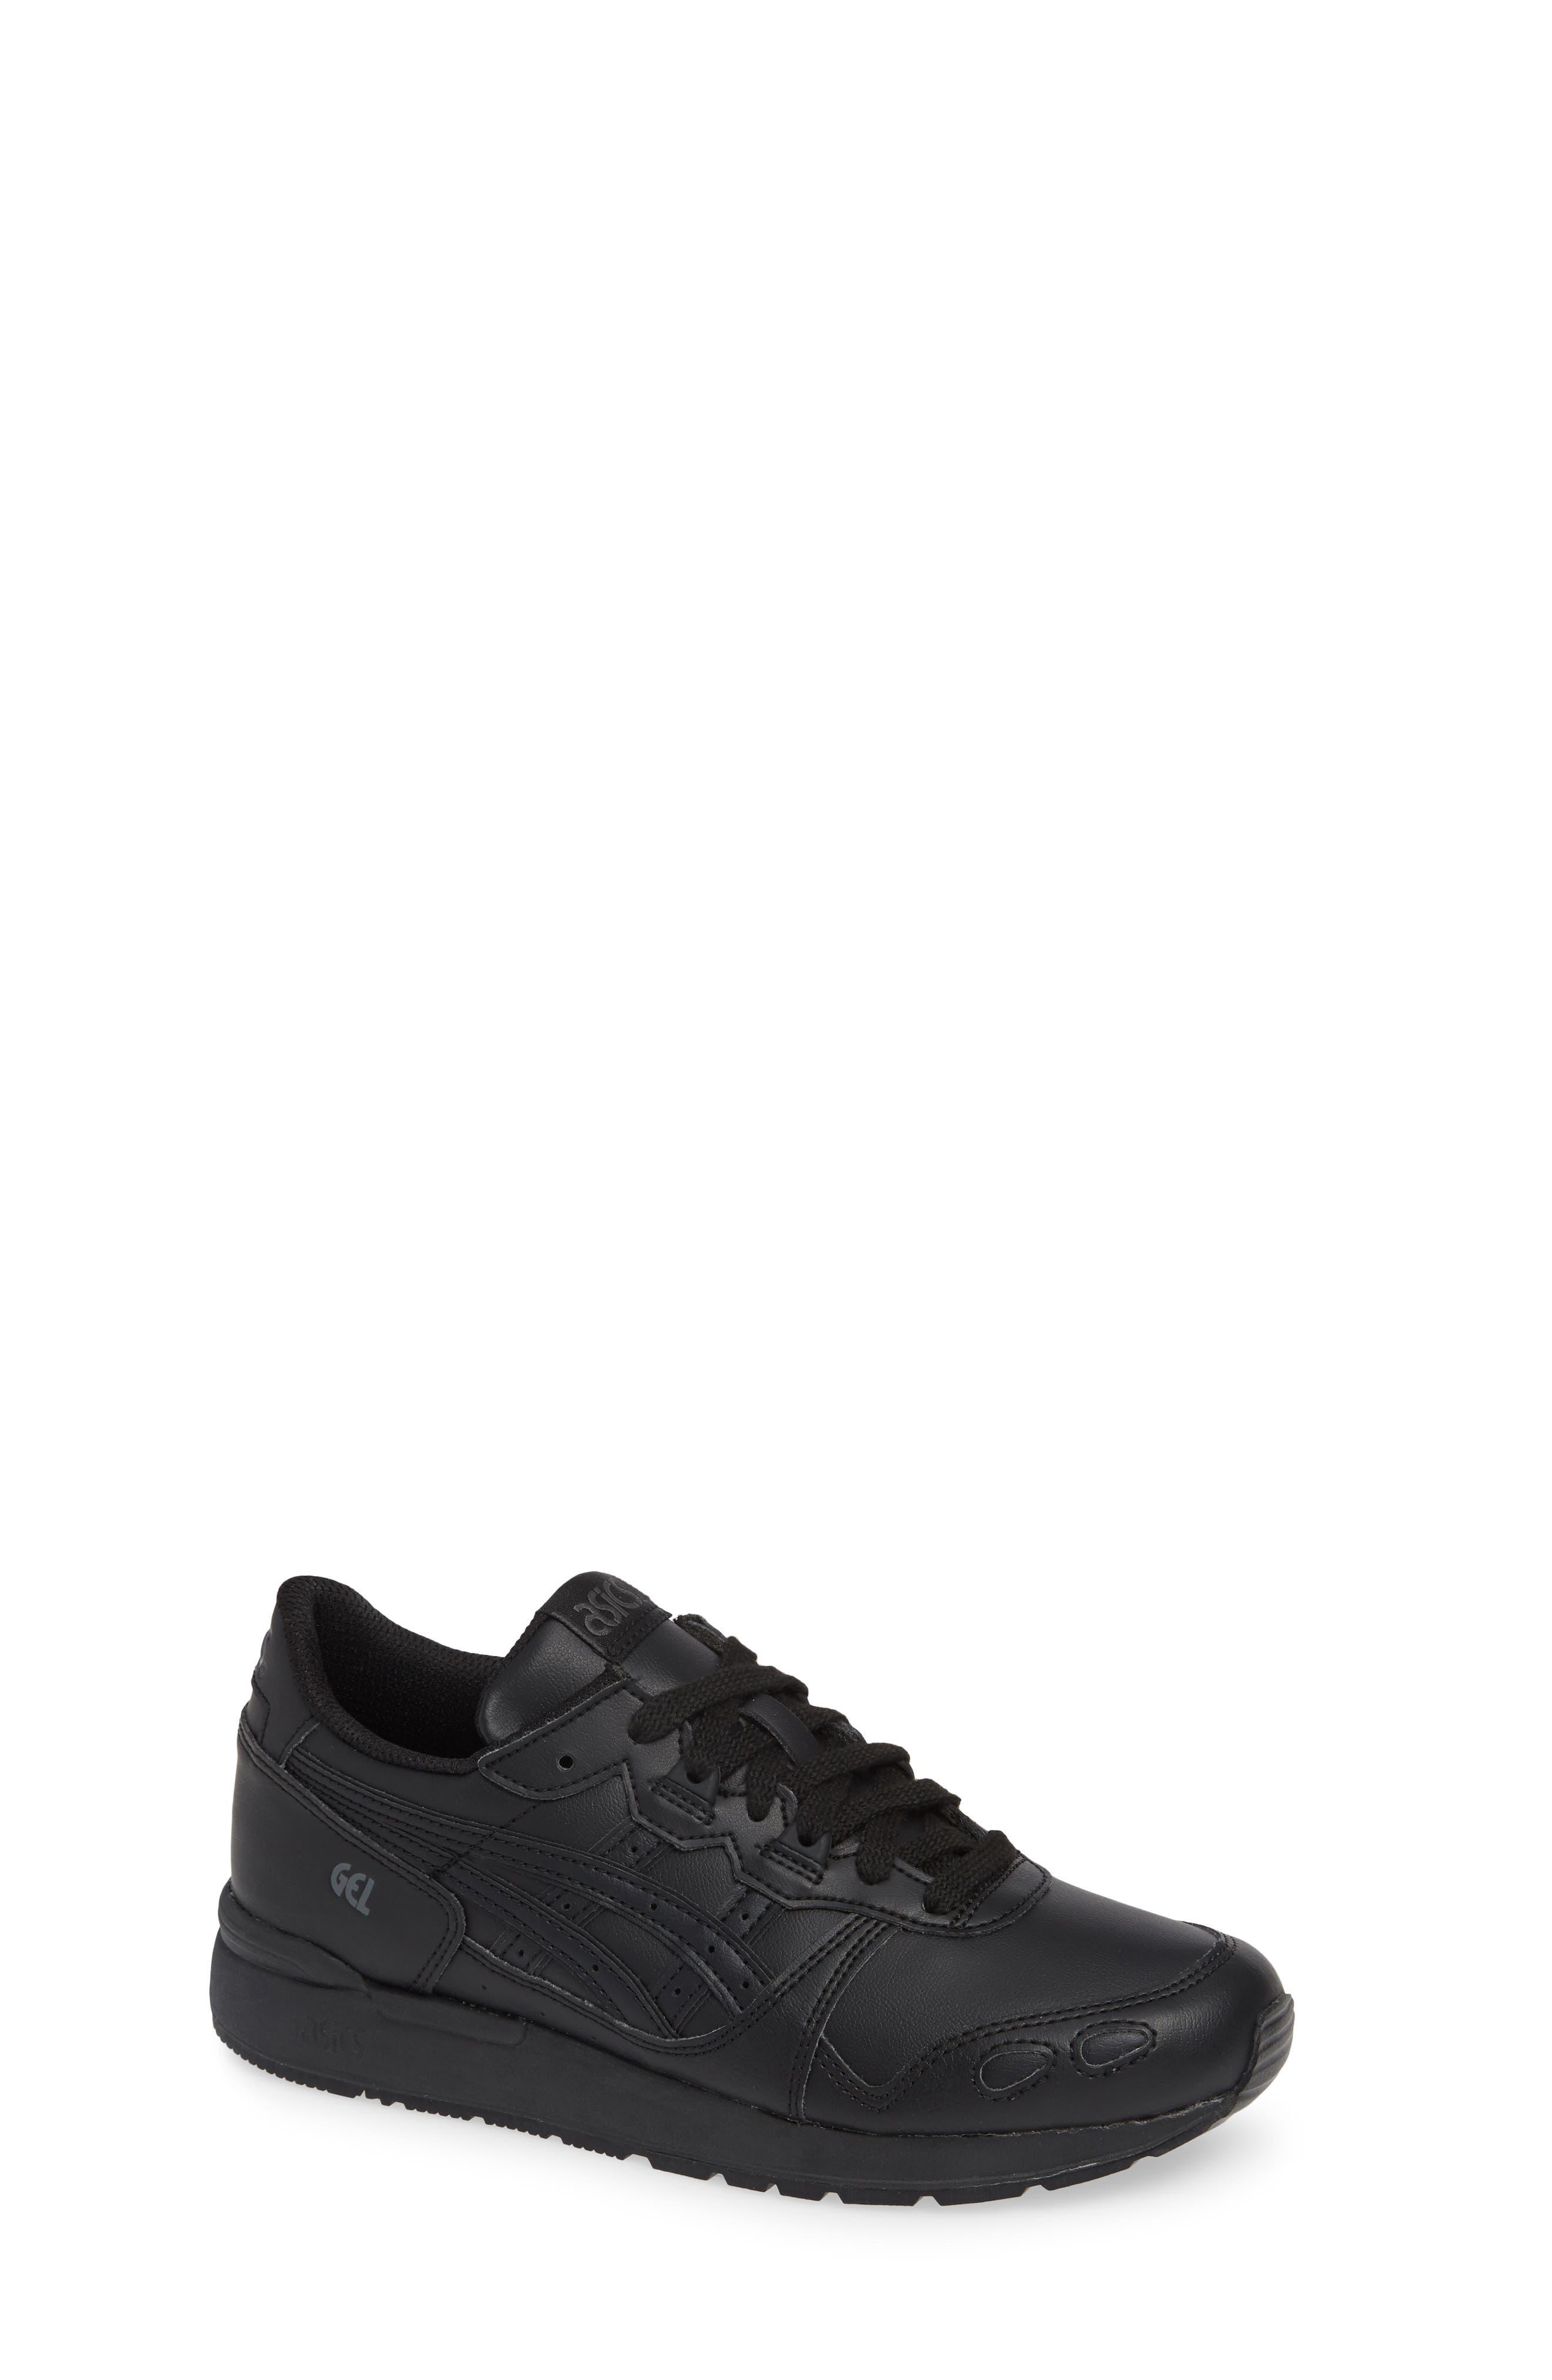 GEL-Lyte III Sneaker,                             Main thumbnail 1, color,                             BLACK/ BLACK